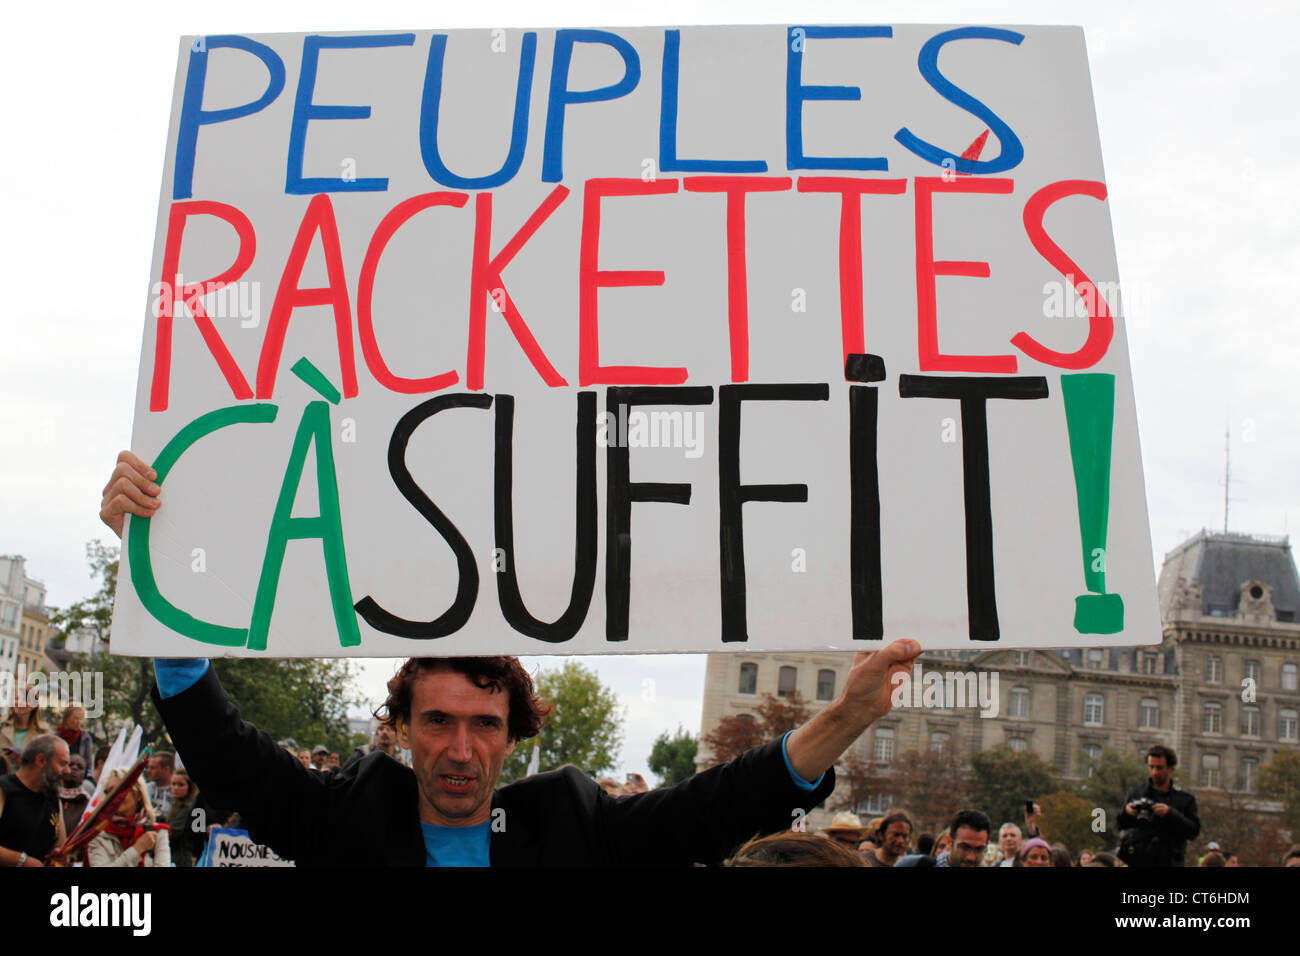 Anticapitalist demonstration - Stock Image